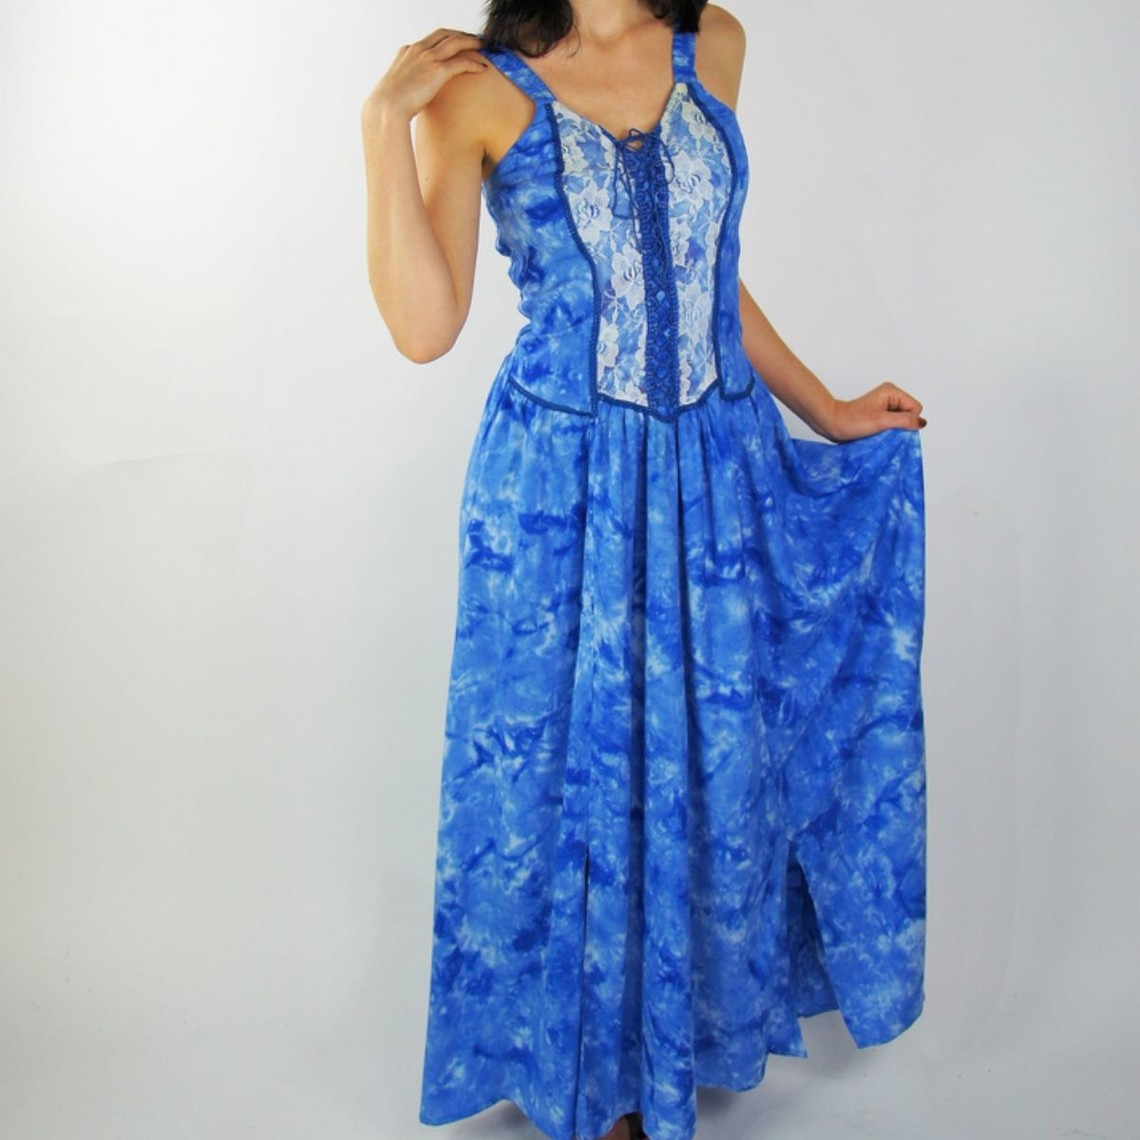 Leonardo Carbone Kleid Aibell, blau